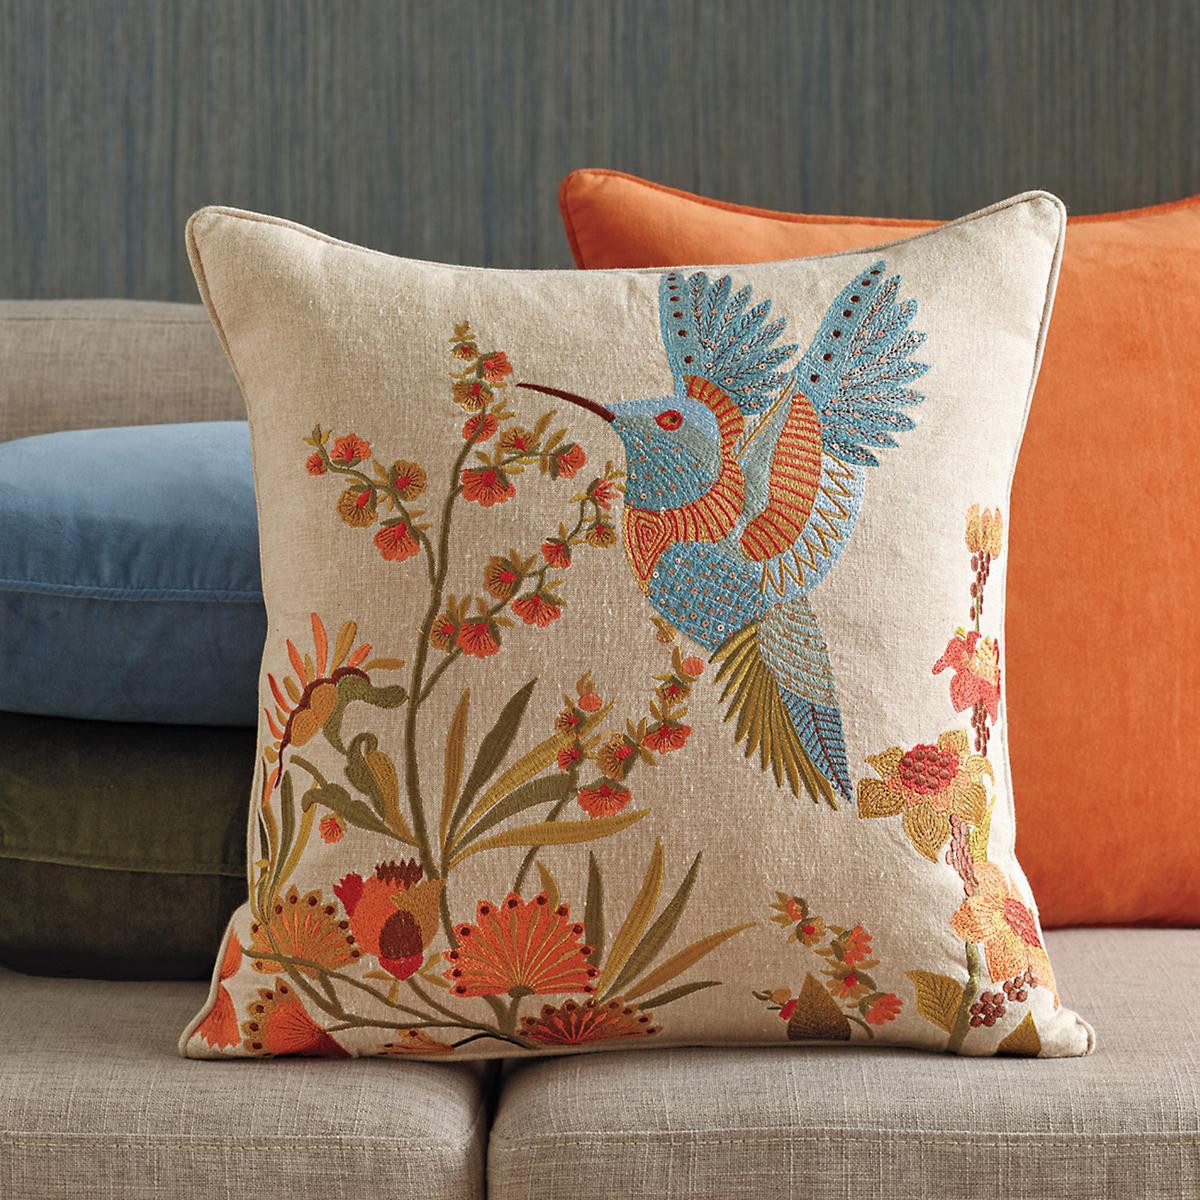 Hummingbird Embroidered Pillow